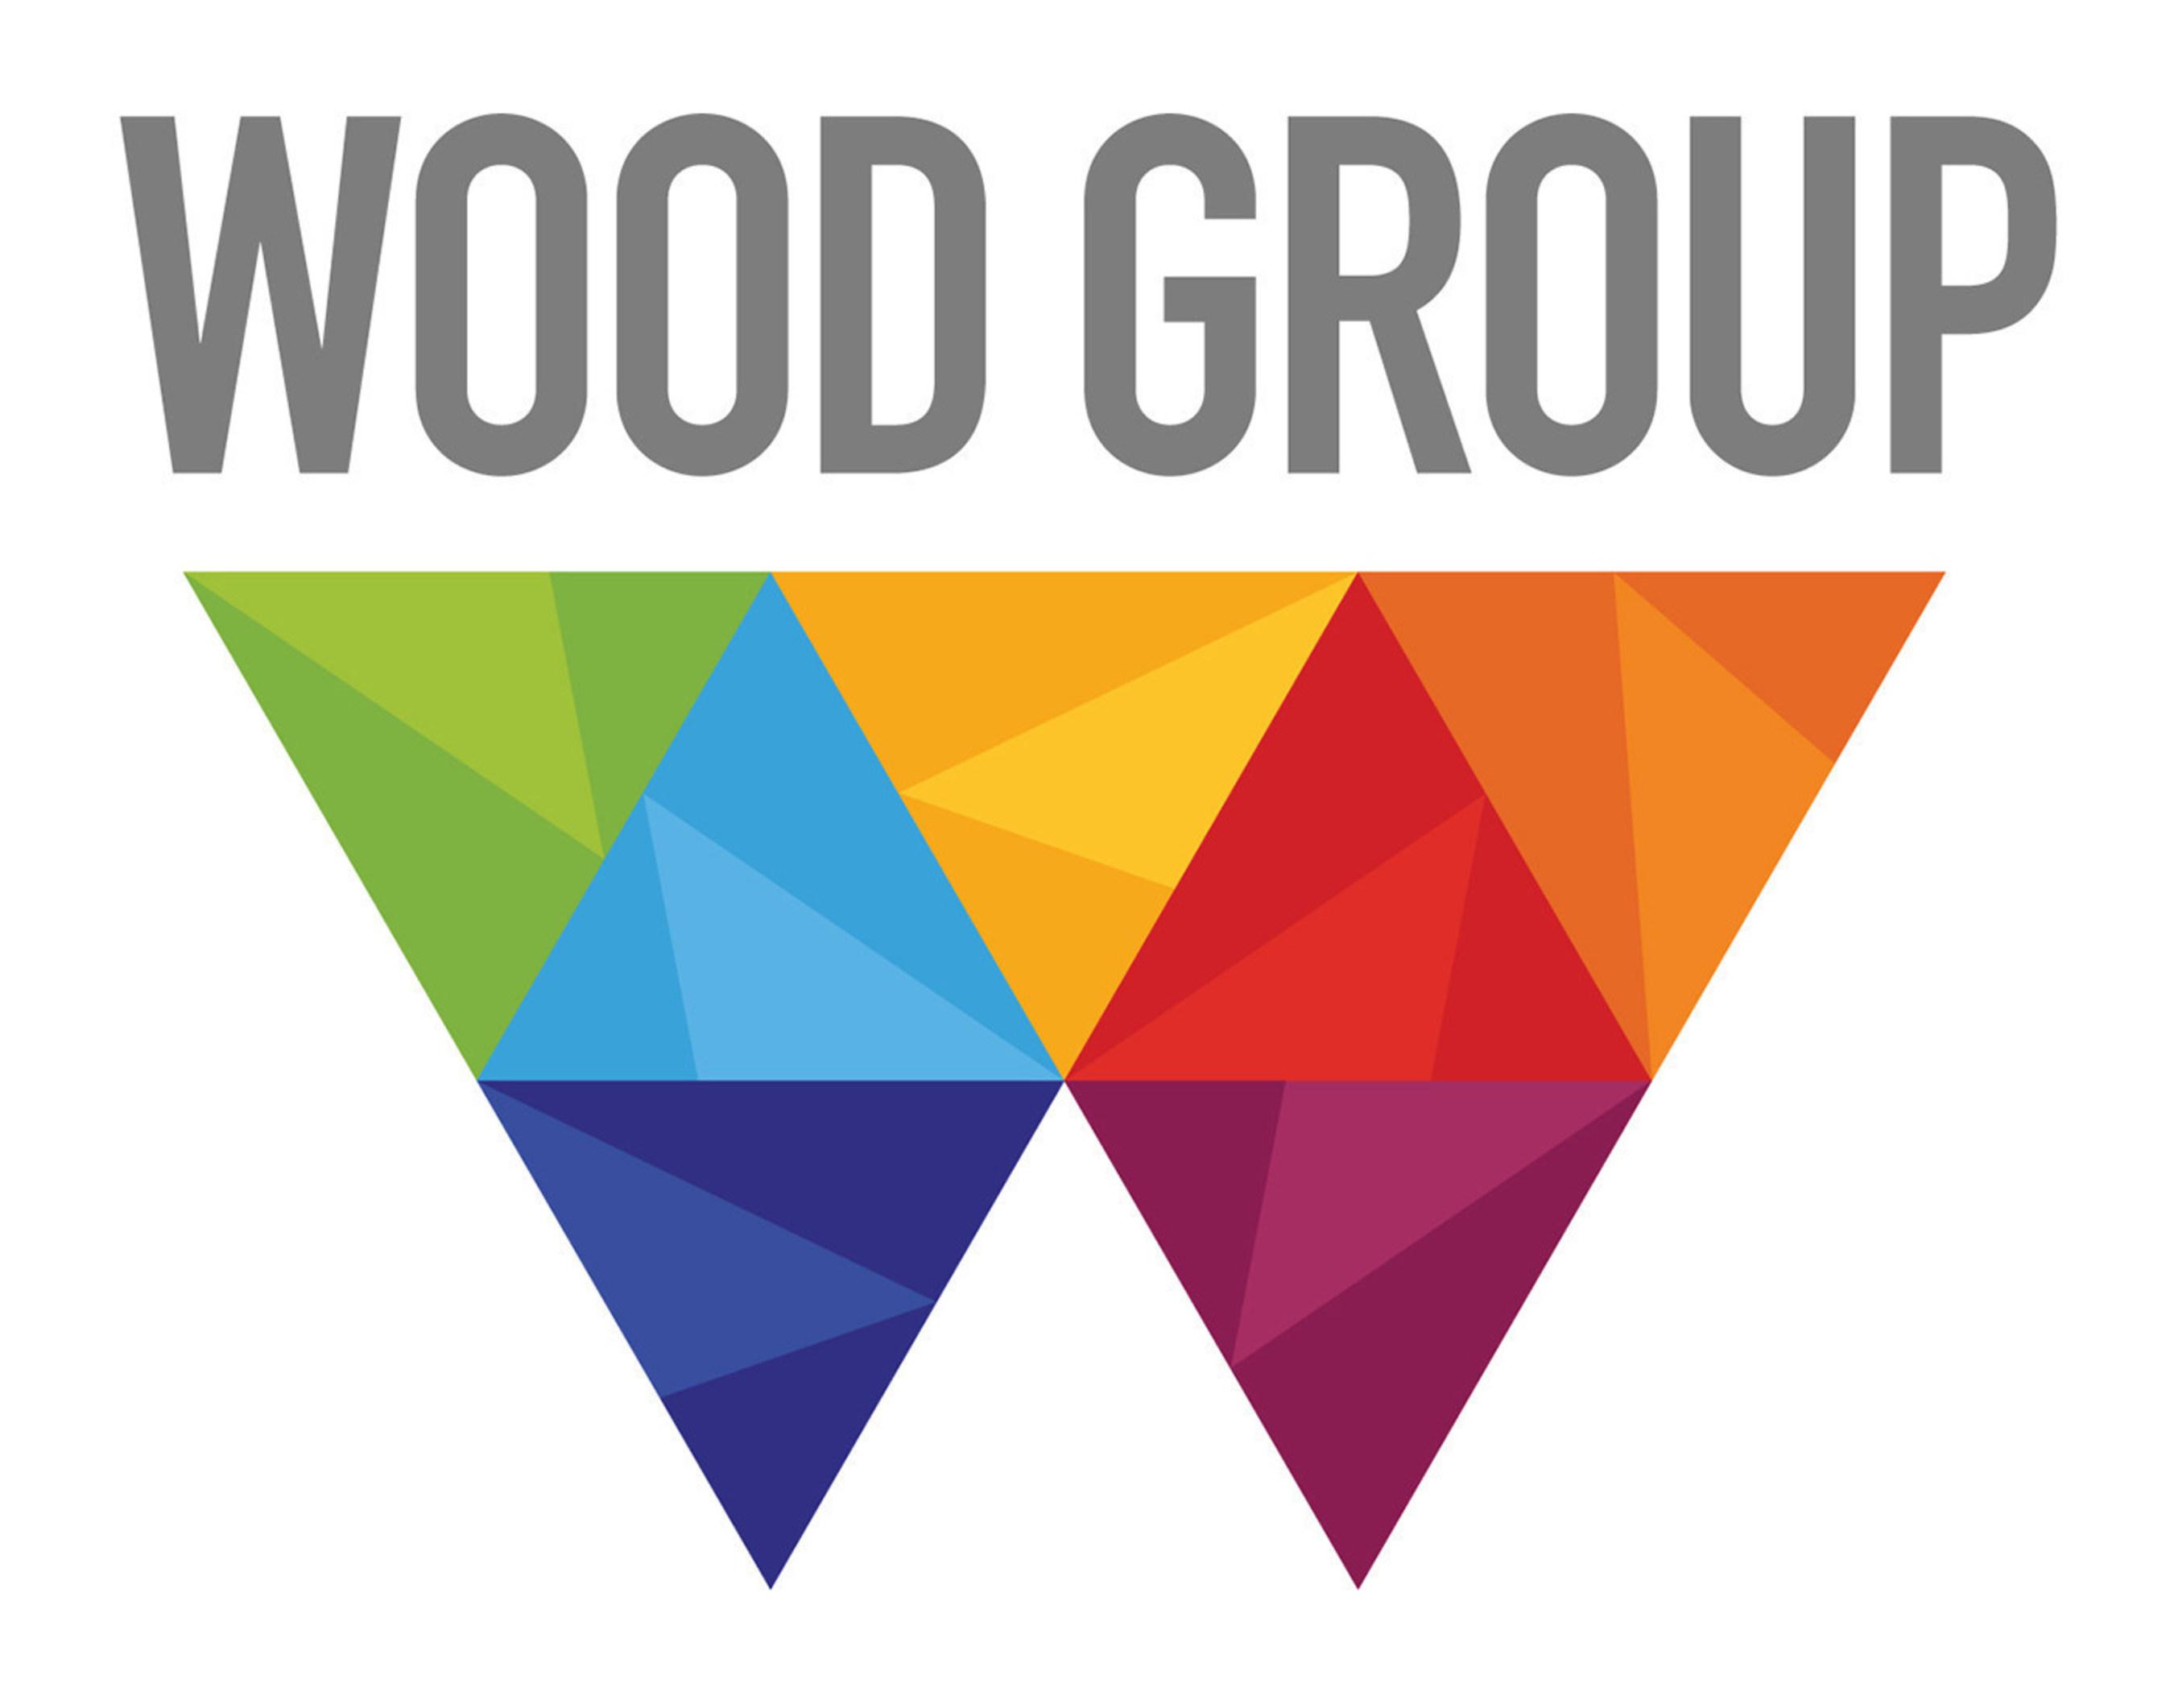 Wood Group logo. (PRNewsFoto/Wood Group) (PRNewsFoto/Wood Group)